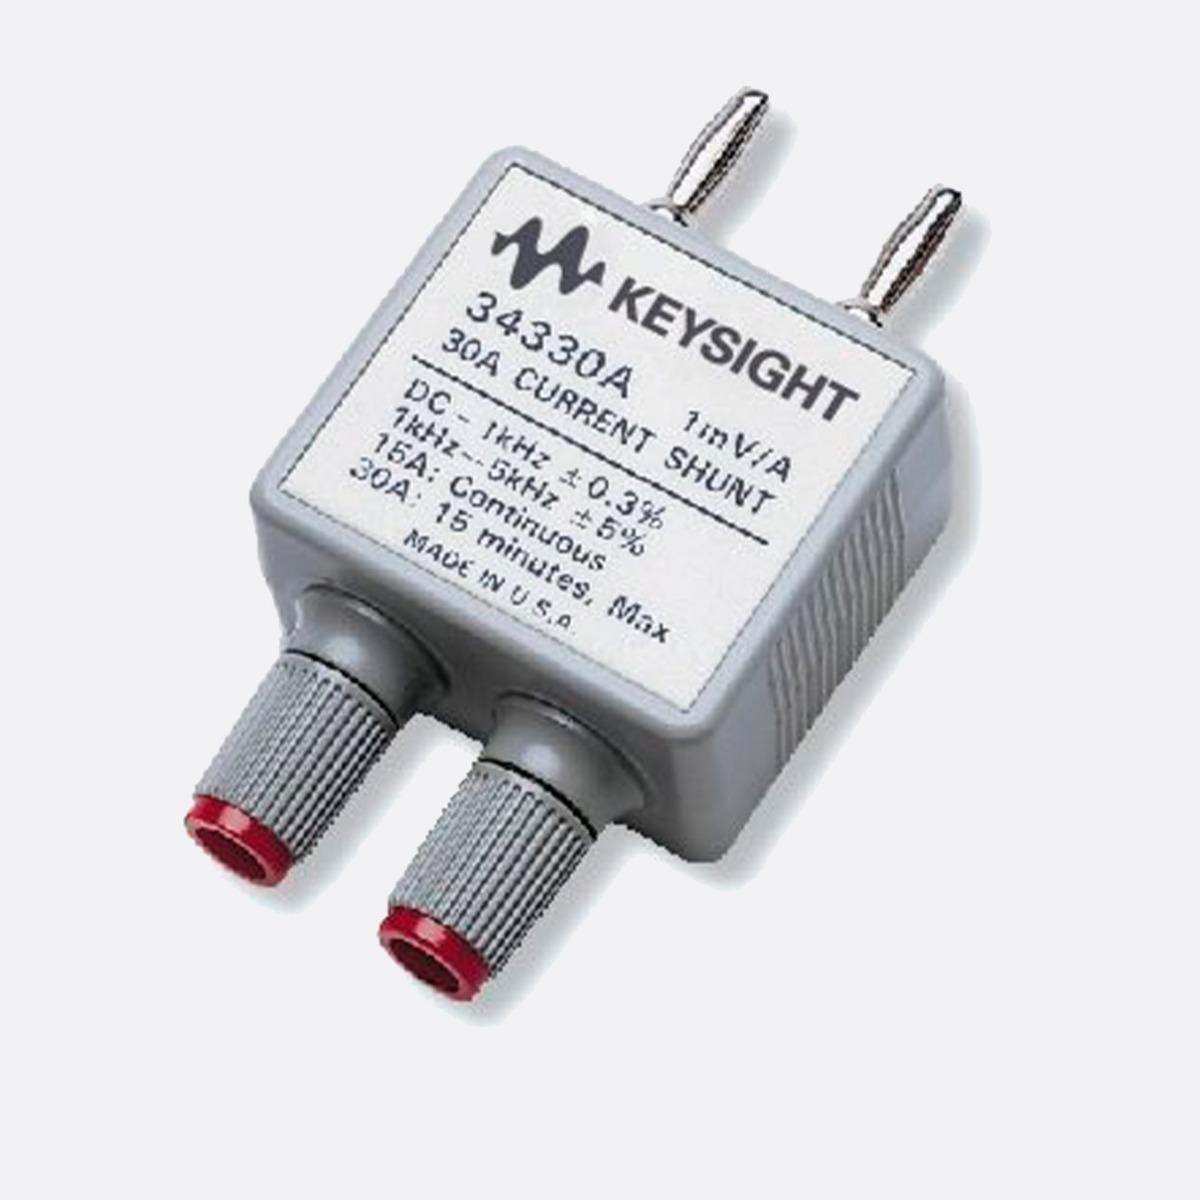 Keysight_34330A_front_Ccontrols